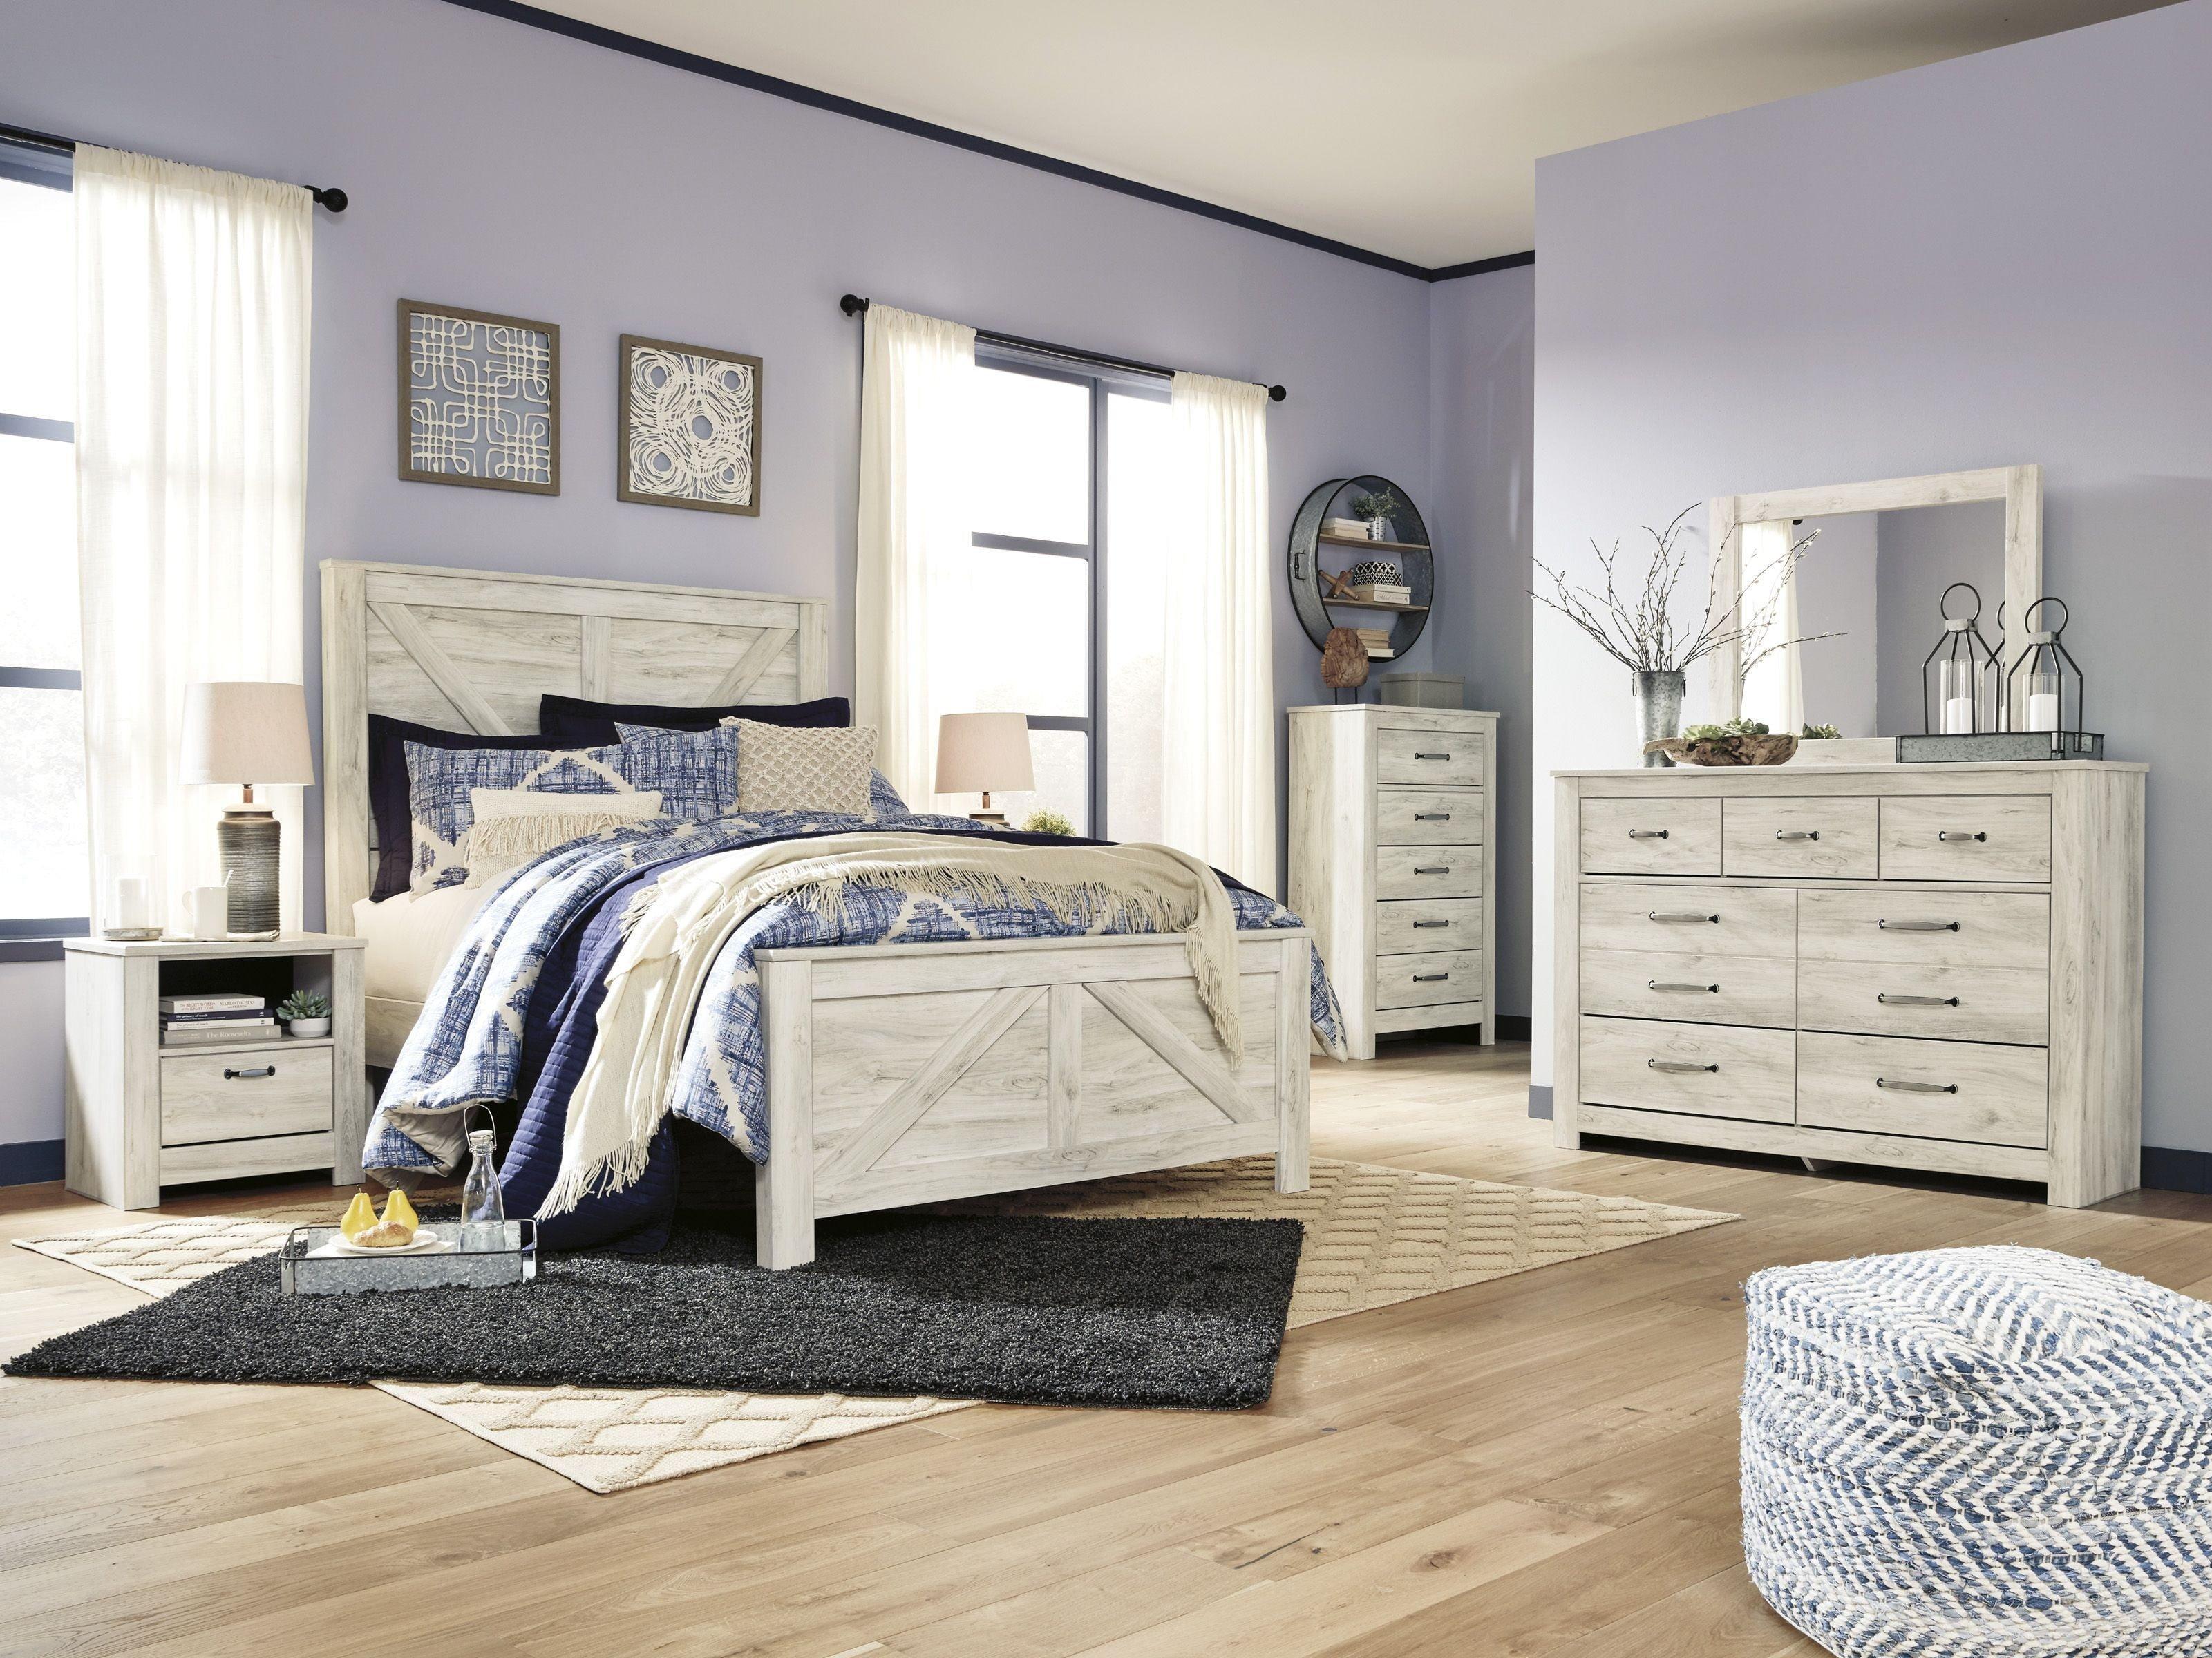 Ashley Furniture Bedroom Set 14 Piece Inspirational Bellaby Whitewash Panel Bedroom Set